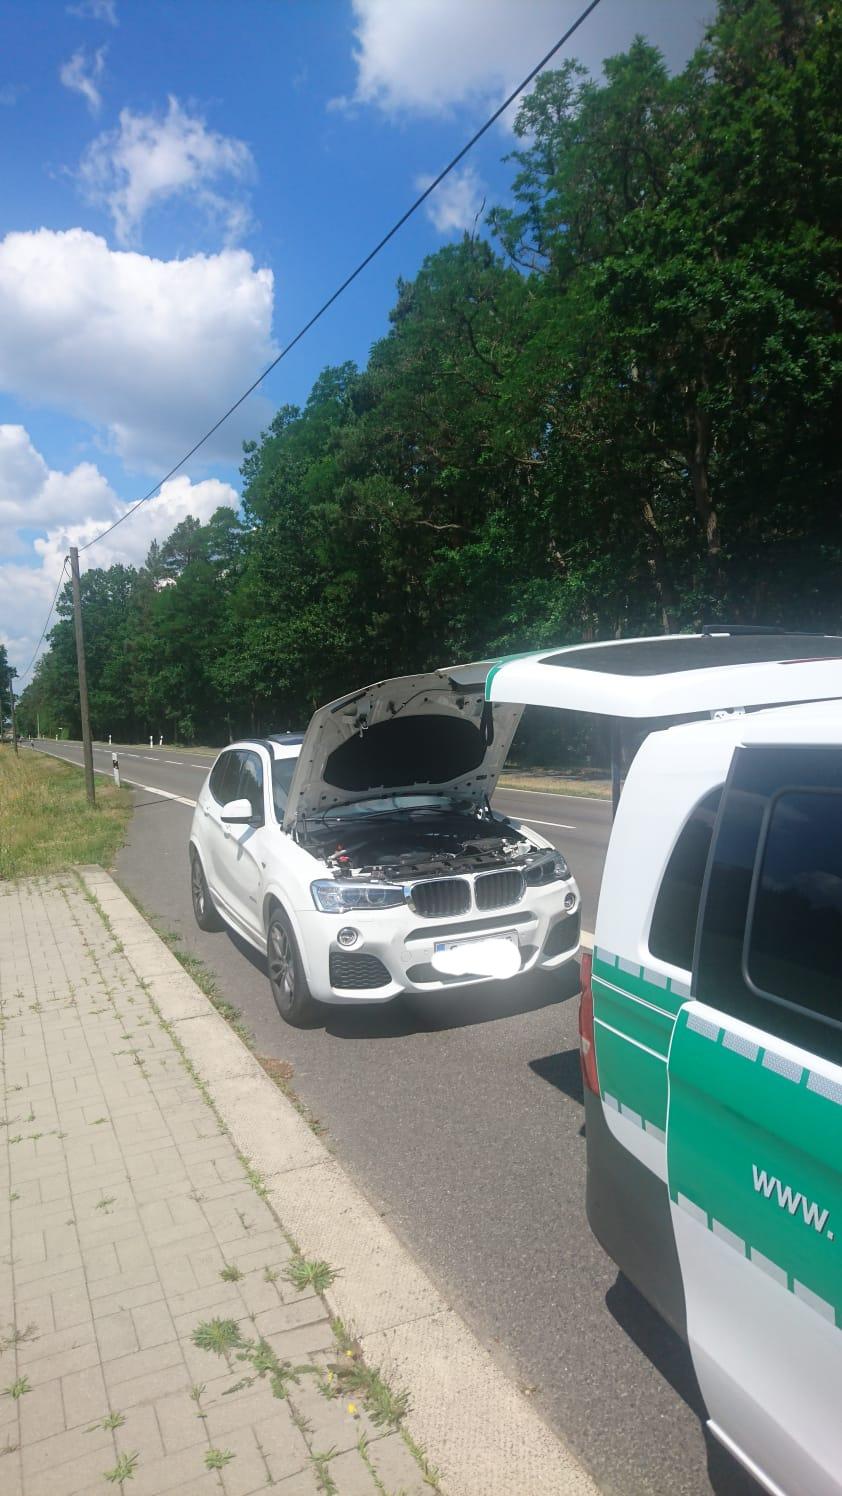 Gestohlener BMW X3 Bild: Bundespolizeiinspektion Ludwigsdorf (ots)